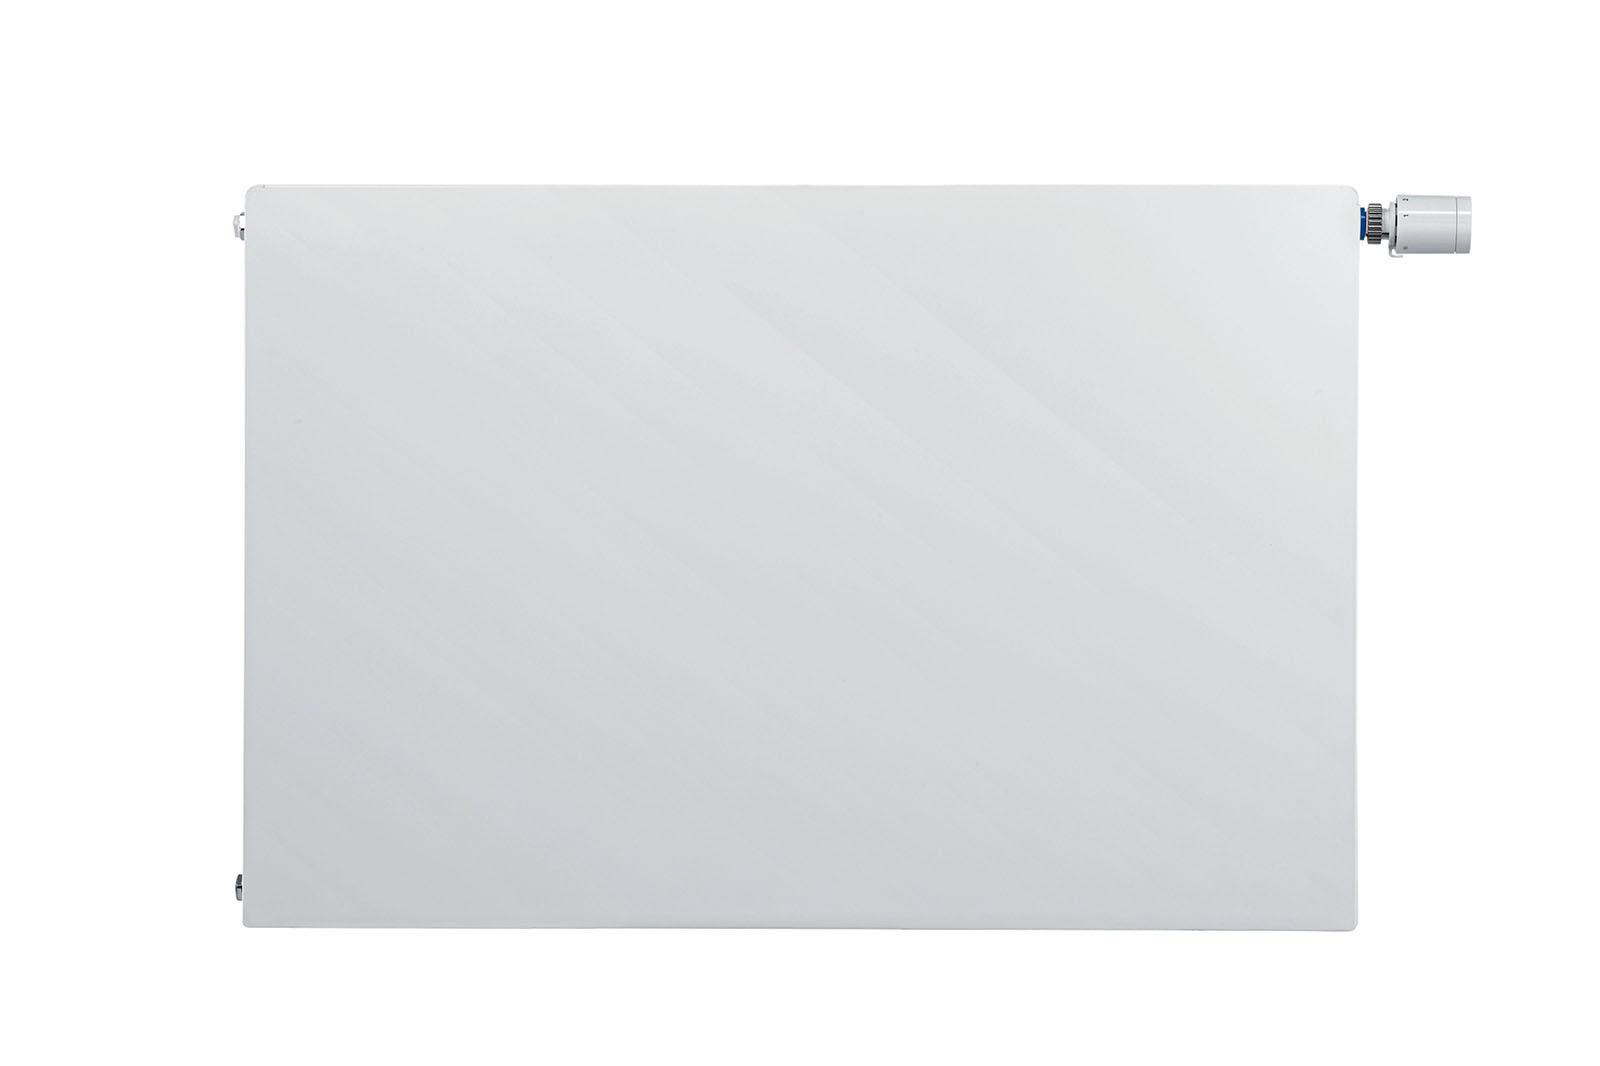 Flachheizkörper Buderus VC-plan Typ 22 900 x 900 mm links mit Wandbefest.